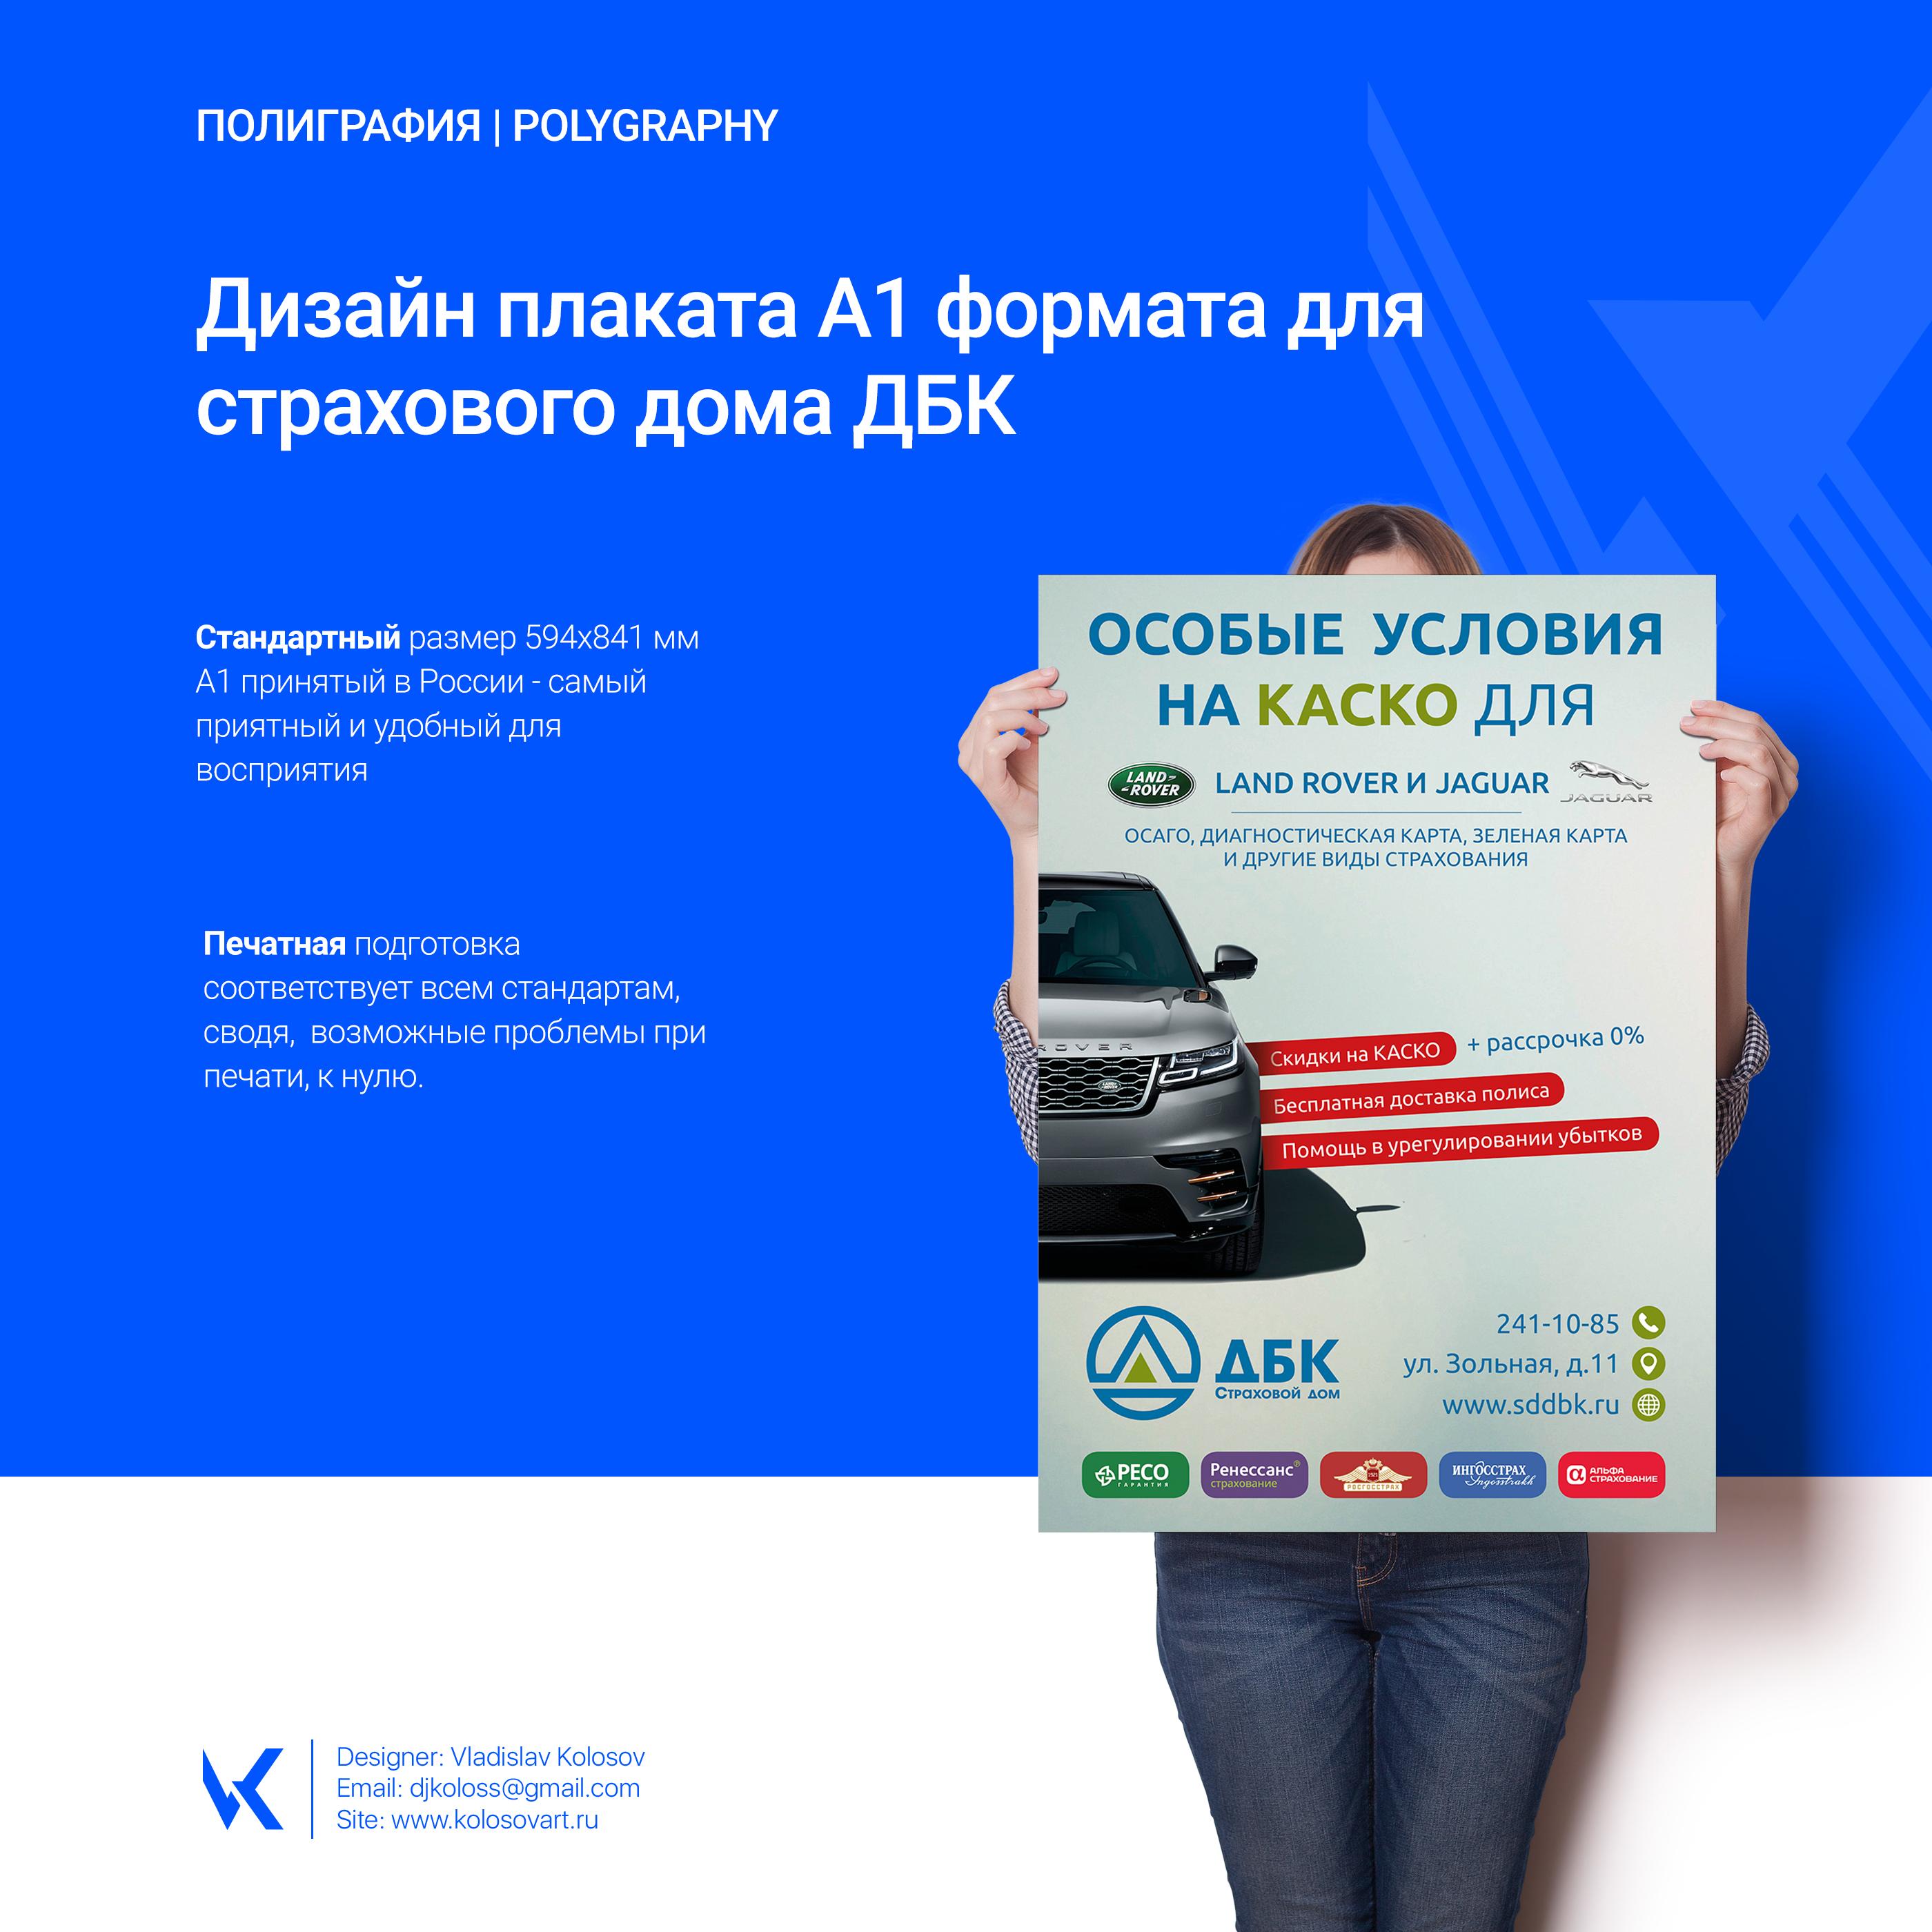 Дизайн плаката А1 формата для страхового дома ДБК